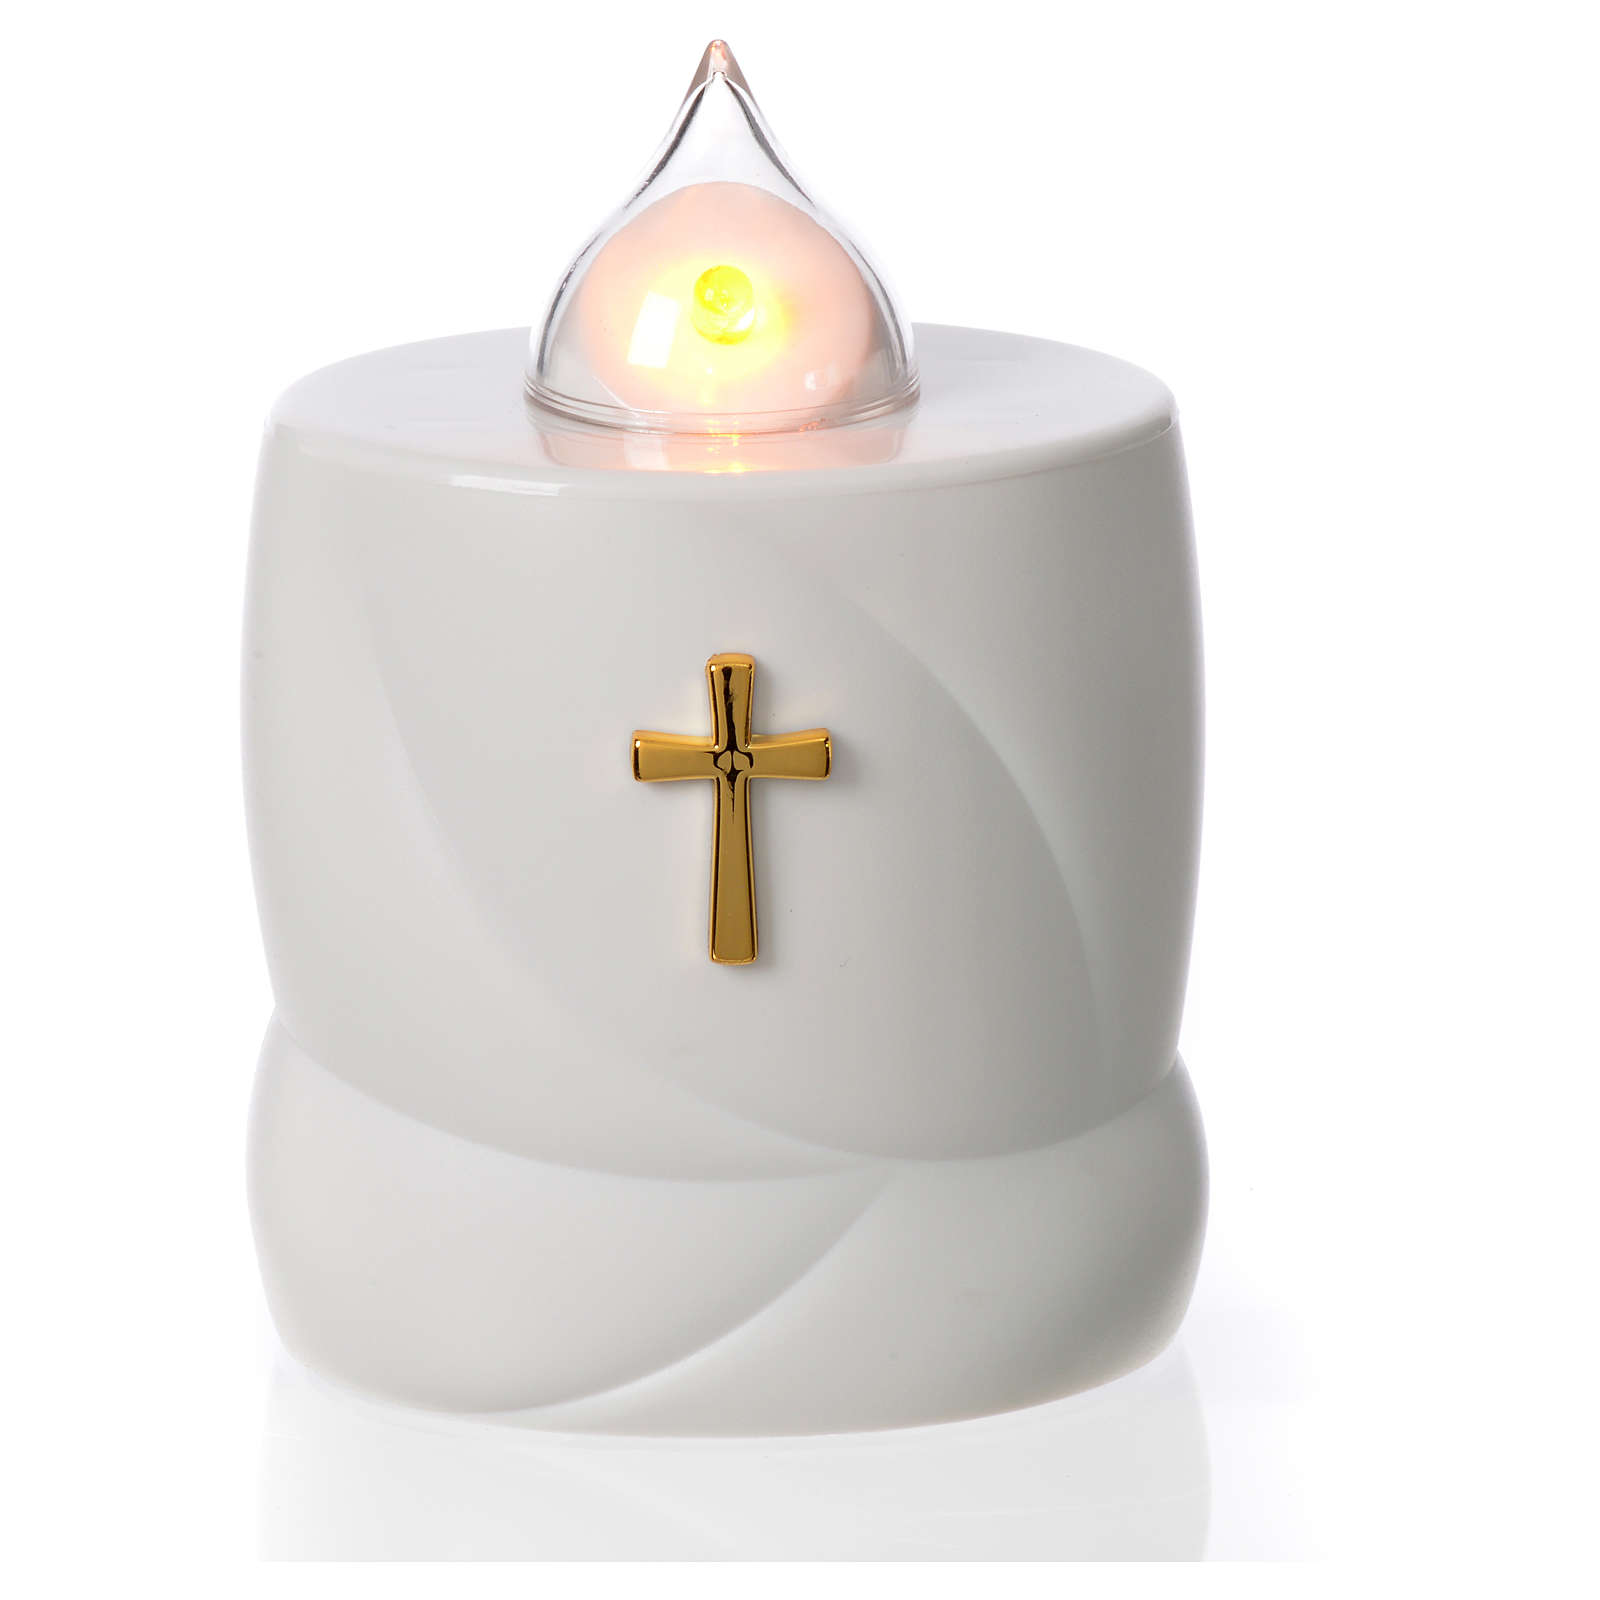 Vela Lumada blanca cruz luz amarilla 3